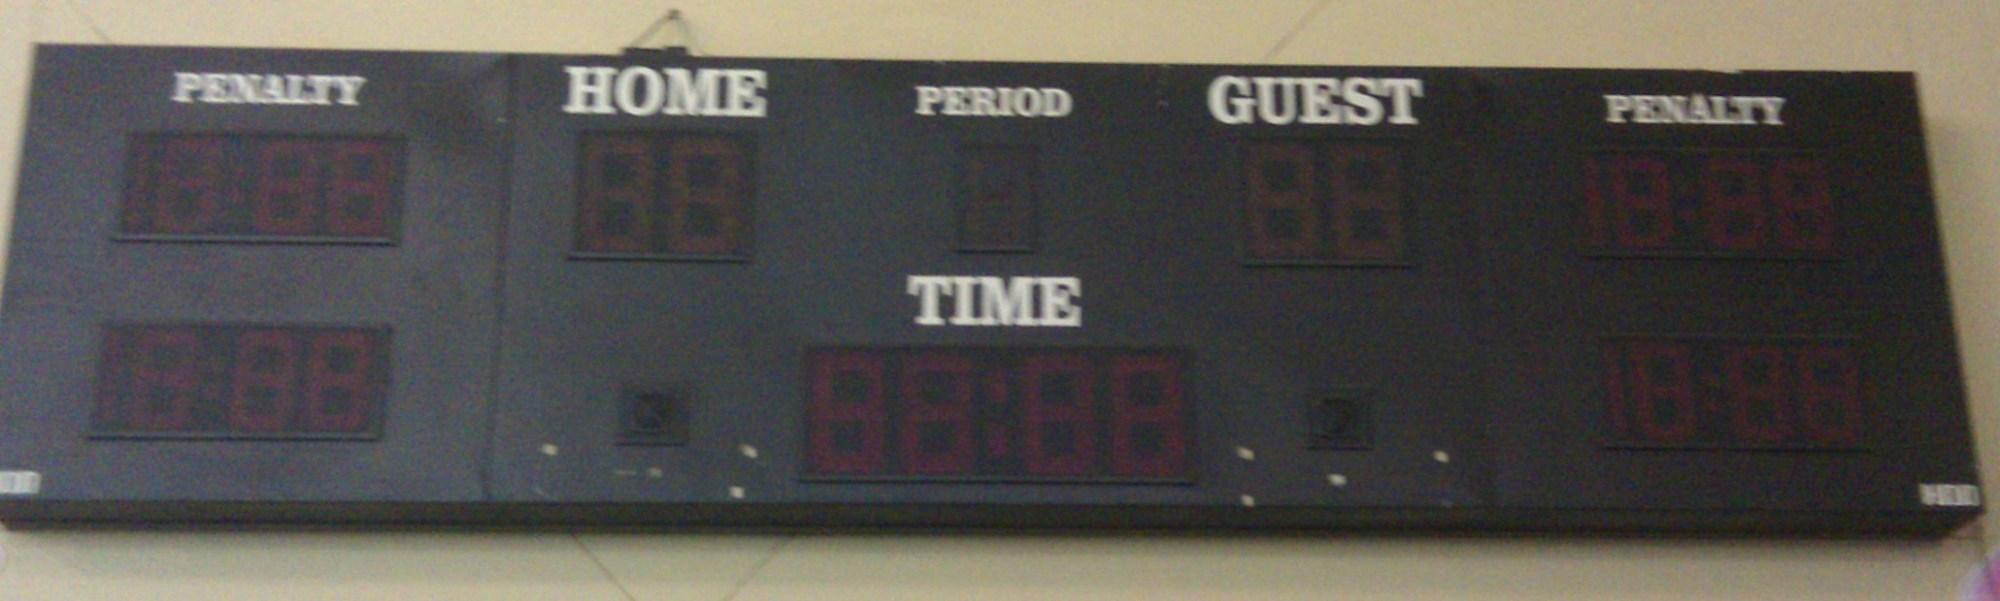 hight resolution of photo of scoreboard